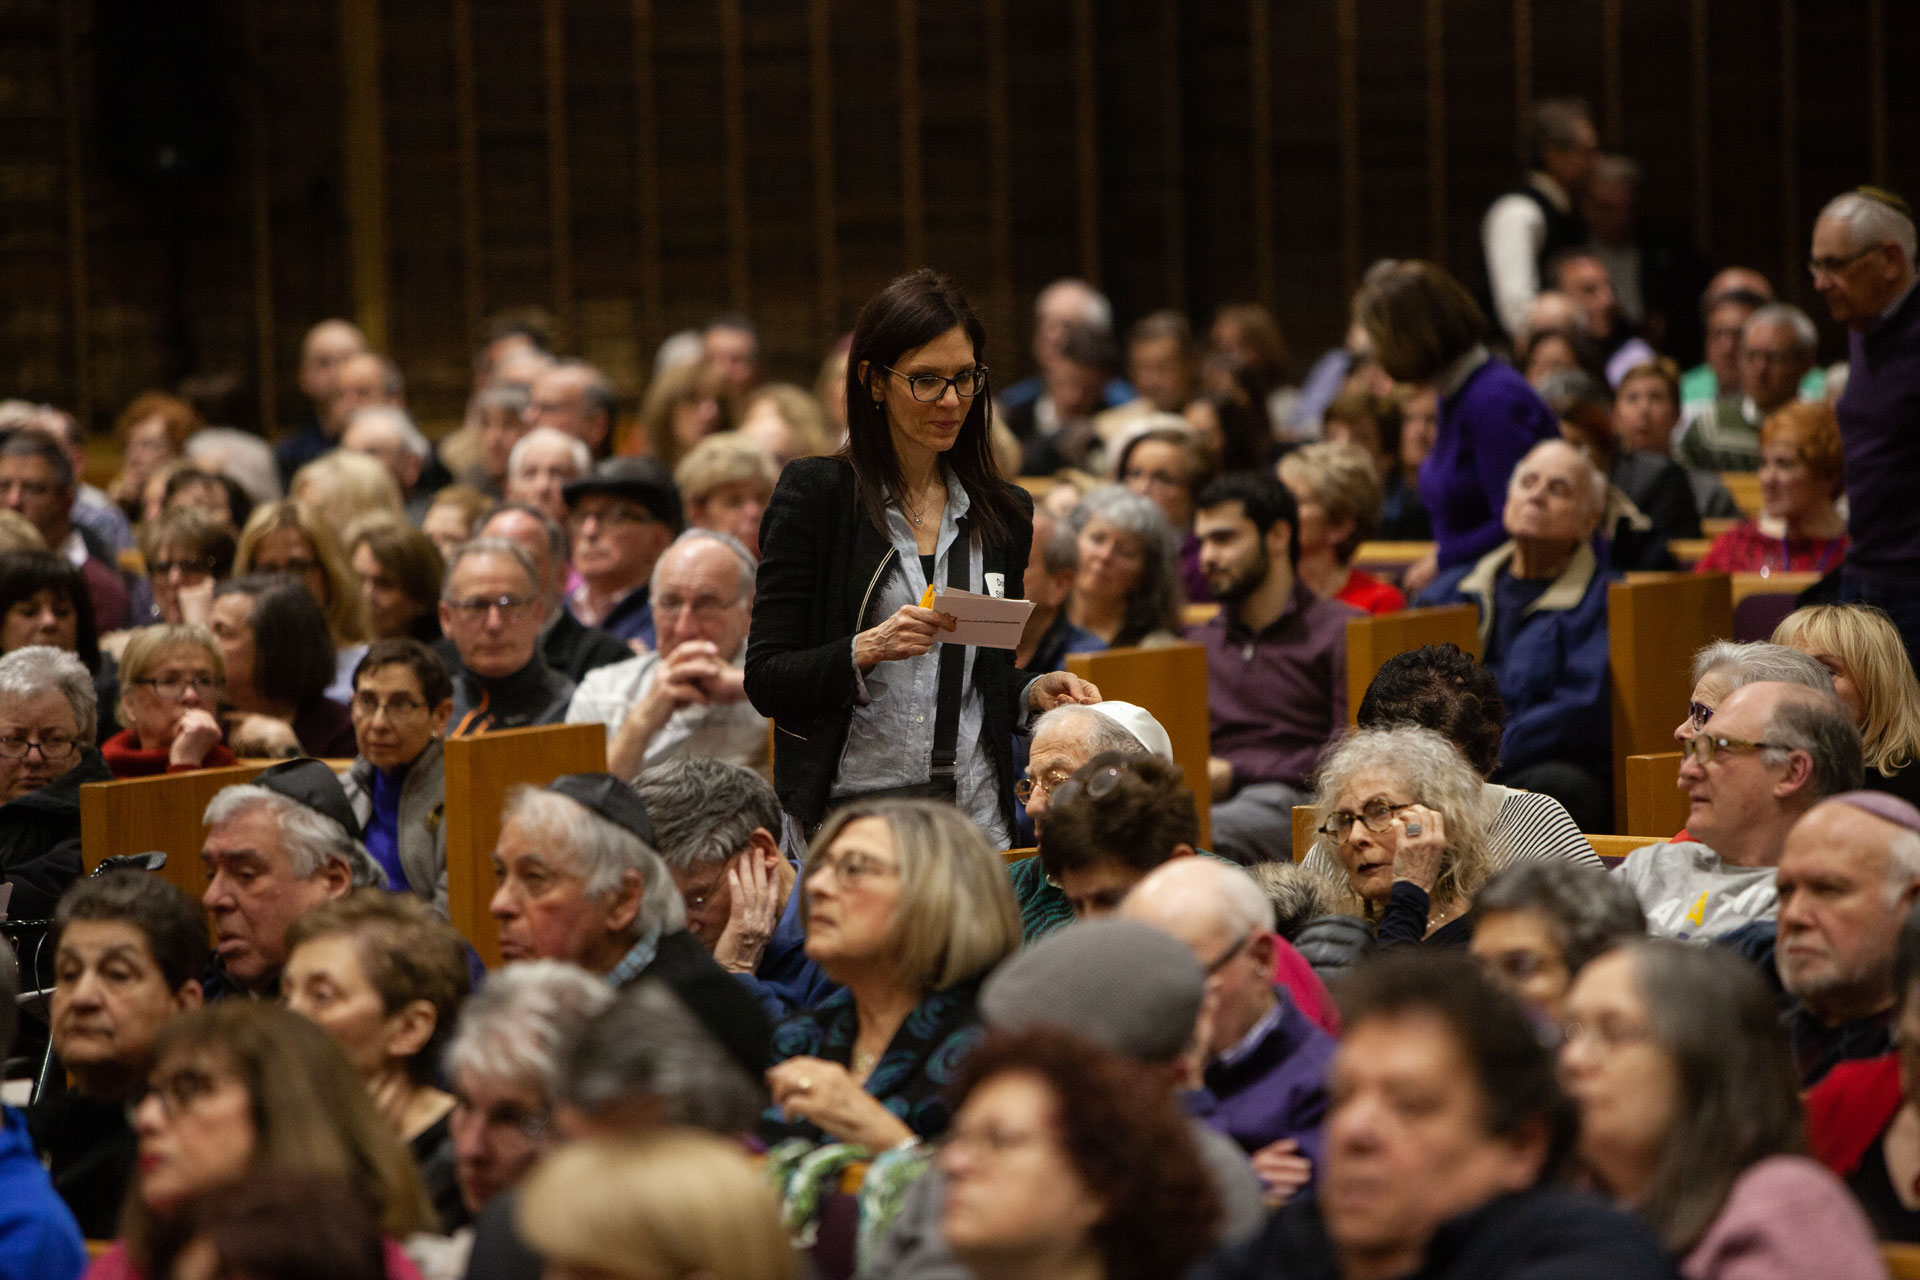 Forum on Anti-Semitism